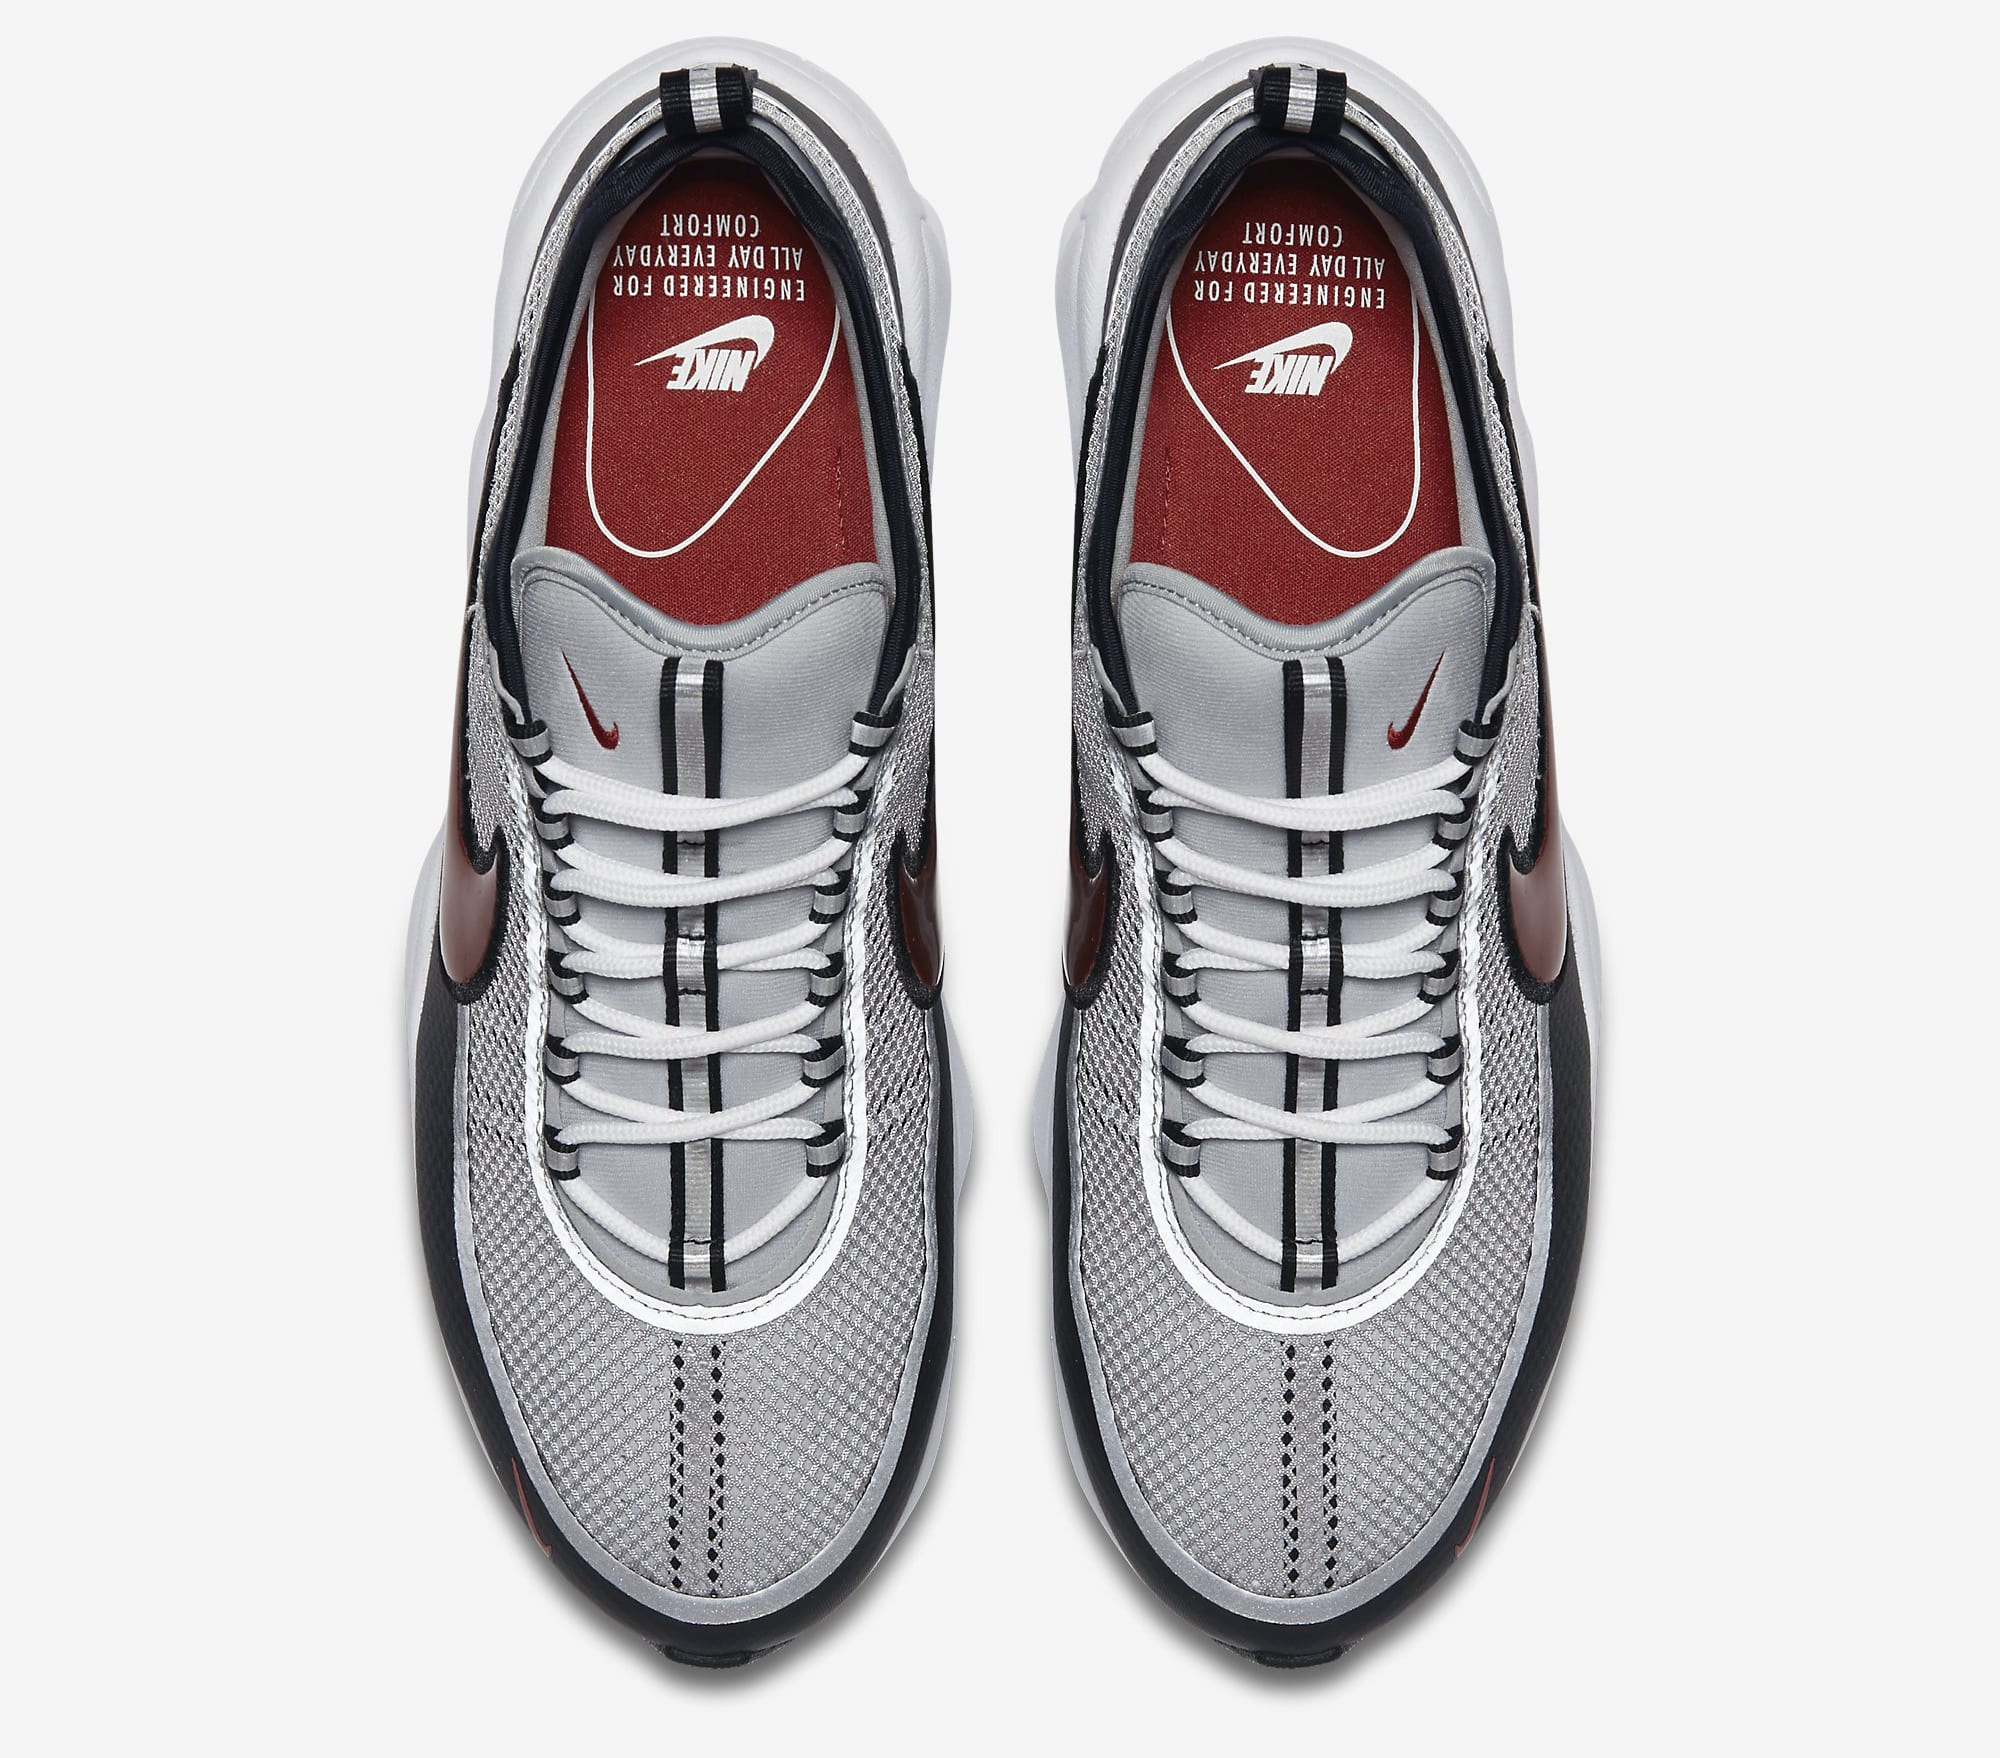 Nike Air Zoom Spiridon Ultra OG 876267-001 Top